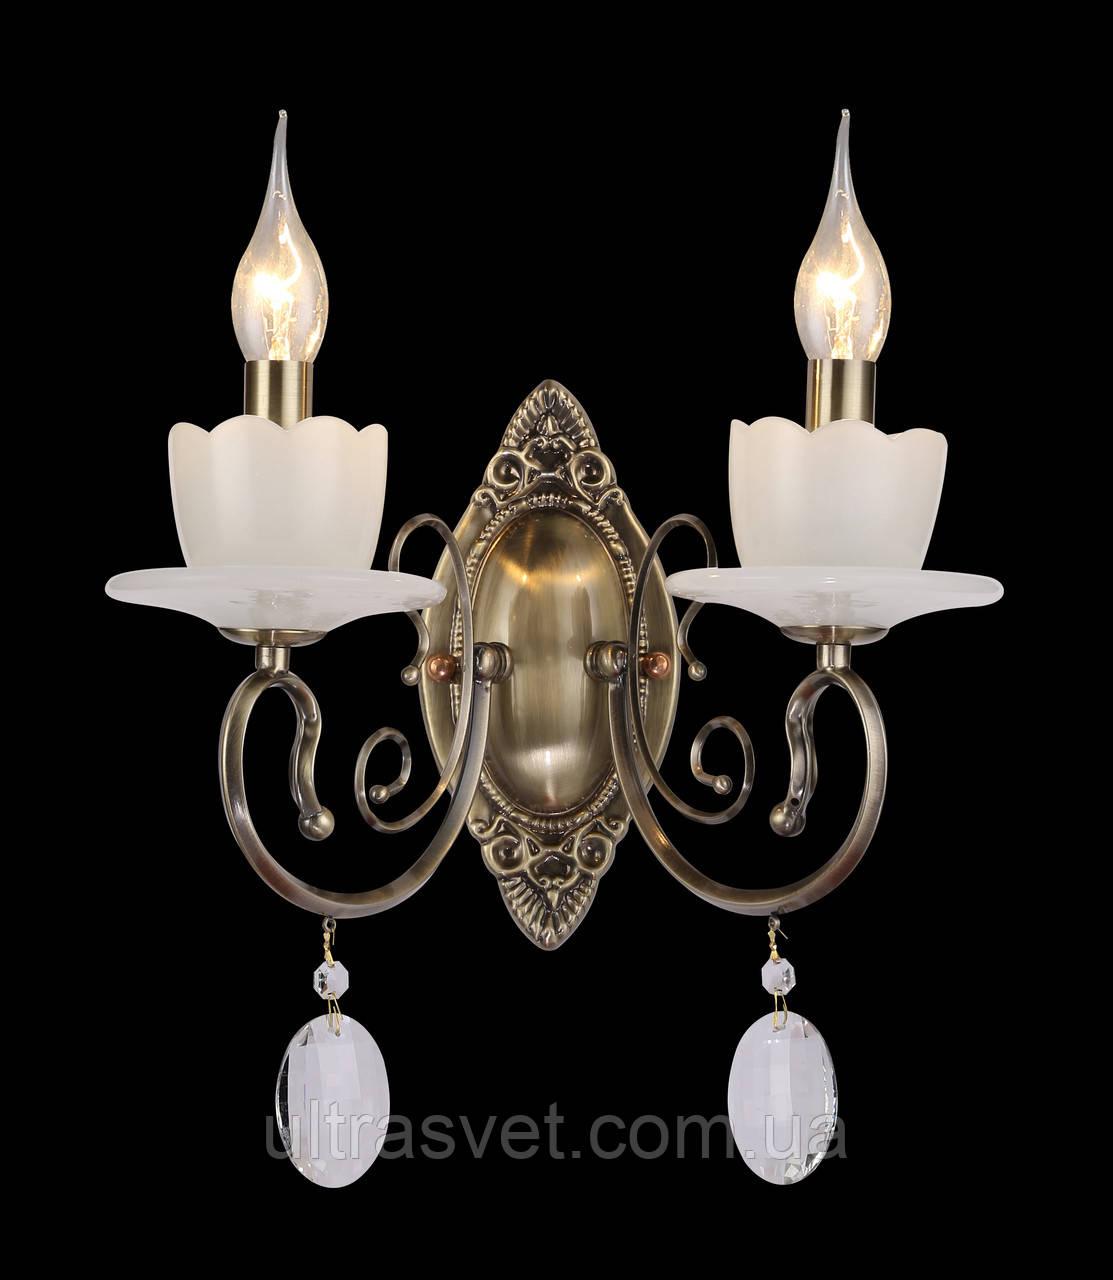 Бра двухламповое свечи 05750-2